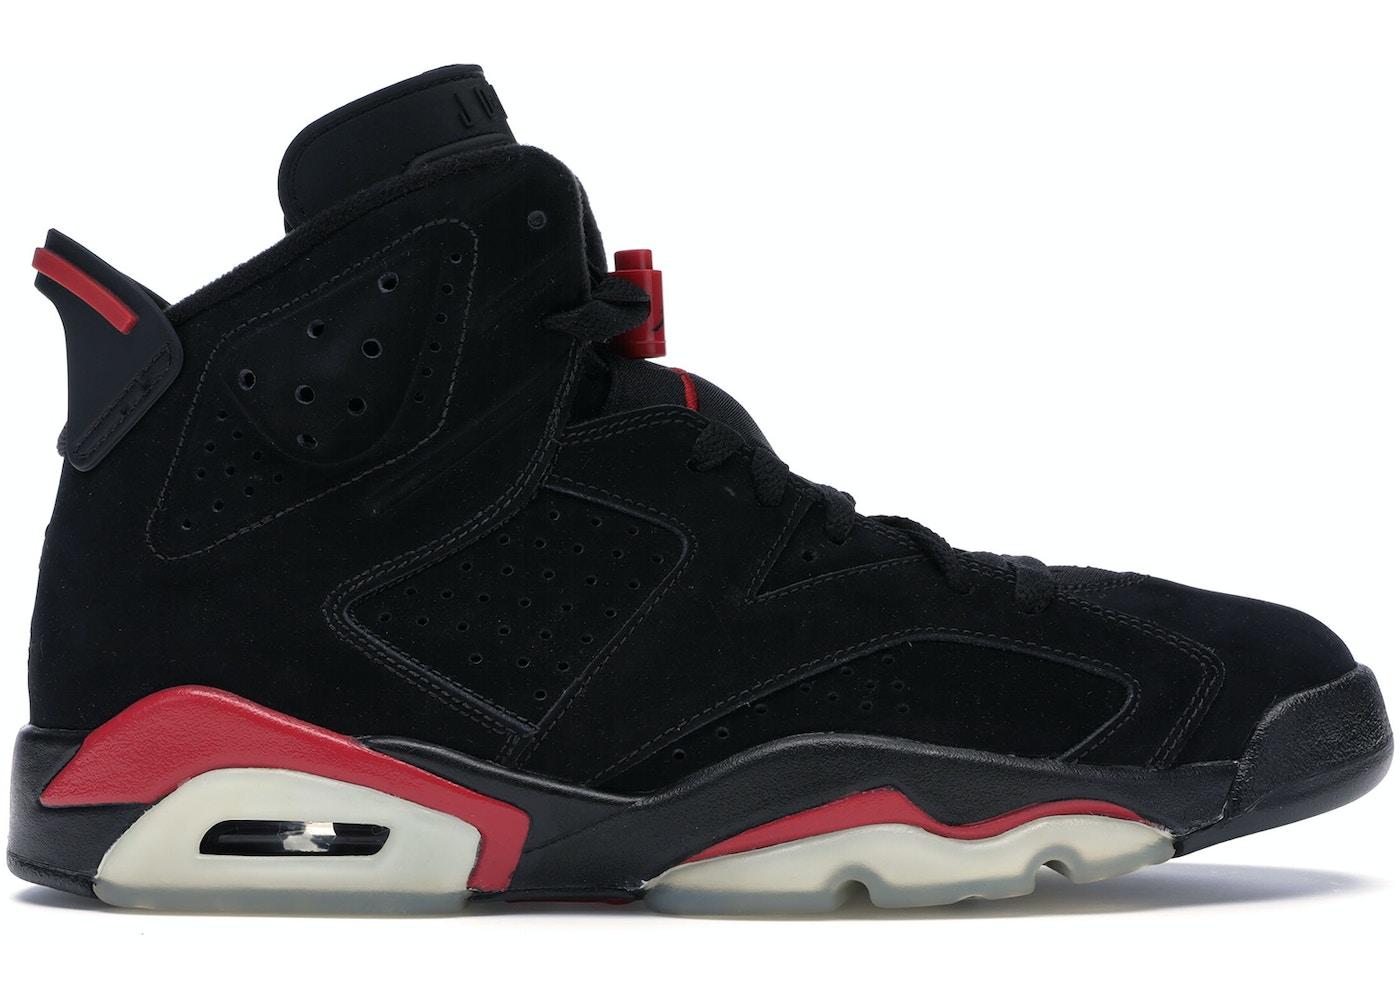 Jordan 6 Retro Black Varsity Red 2010 384664 061